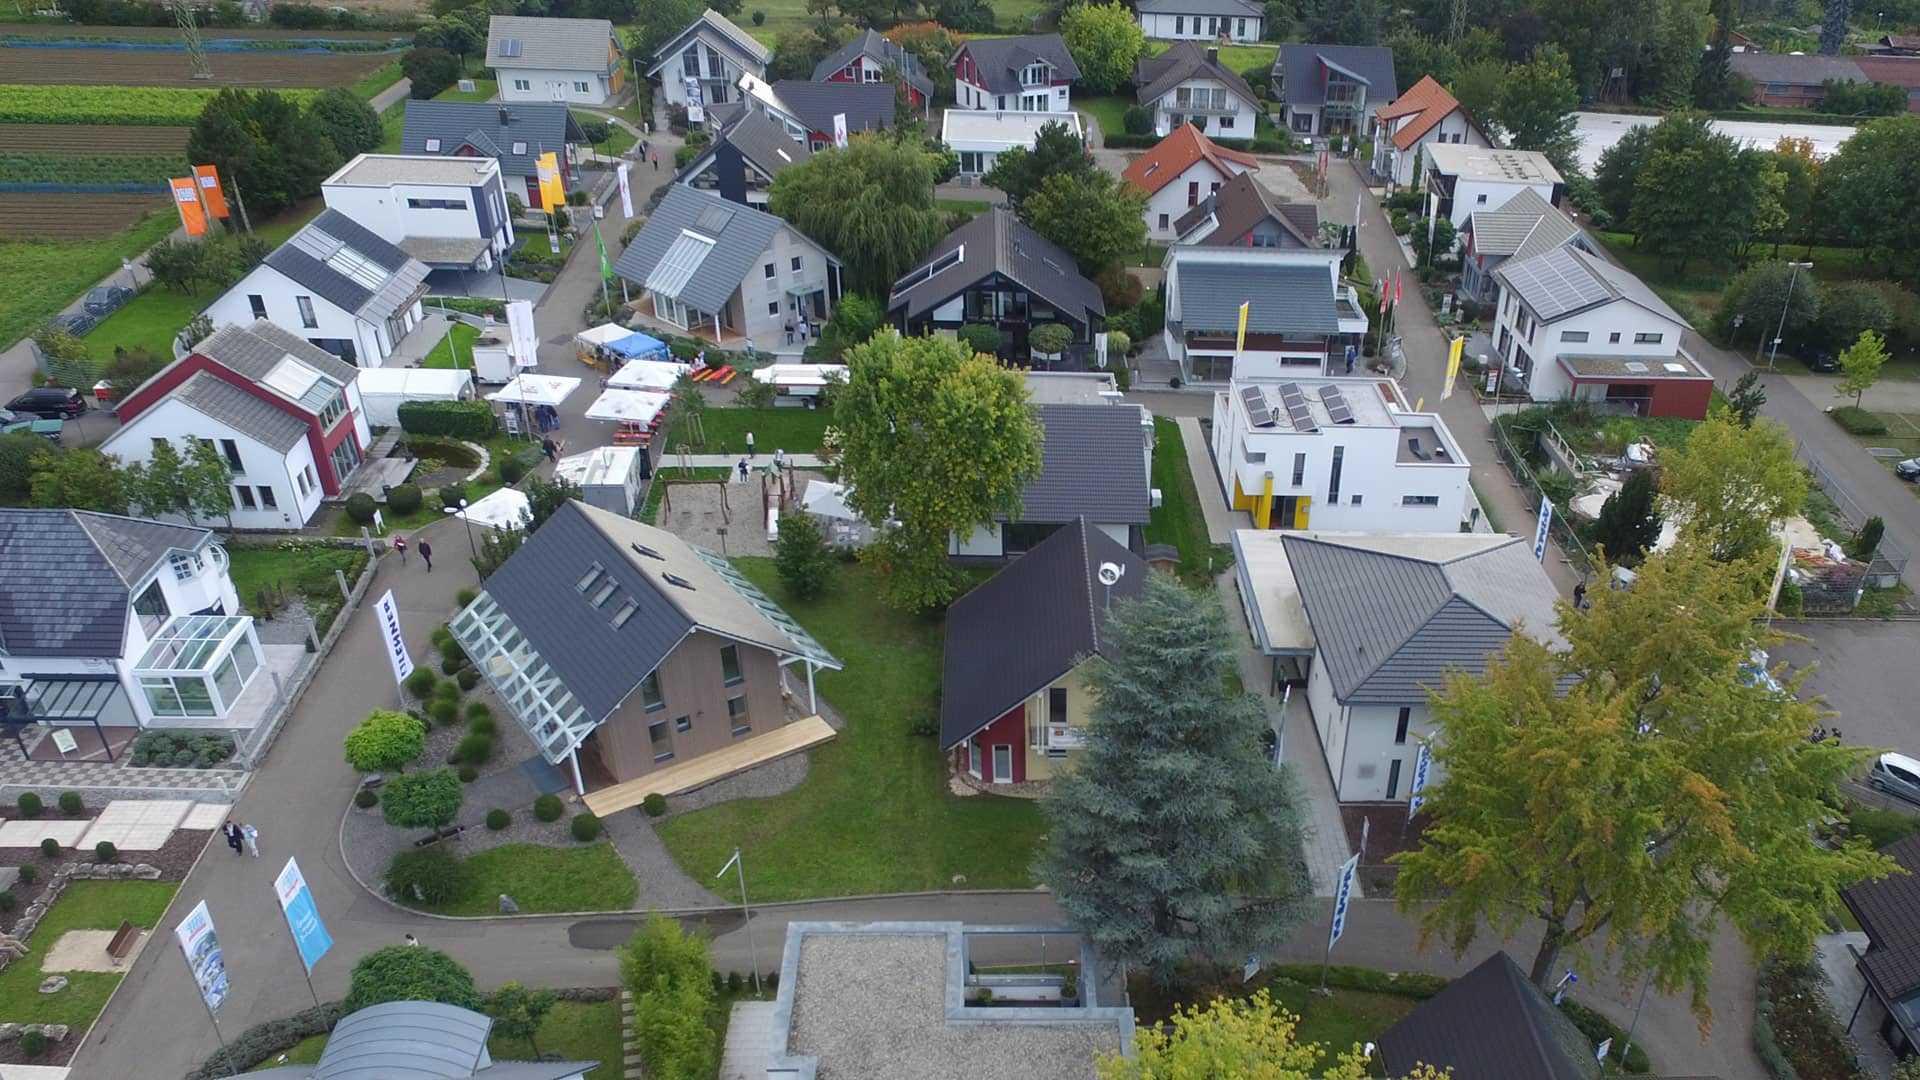 ᐅ Alle Musterhausparks Musterhausausstellungen